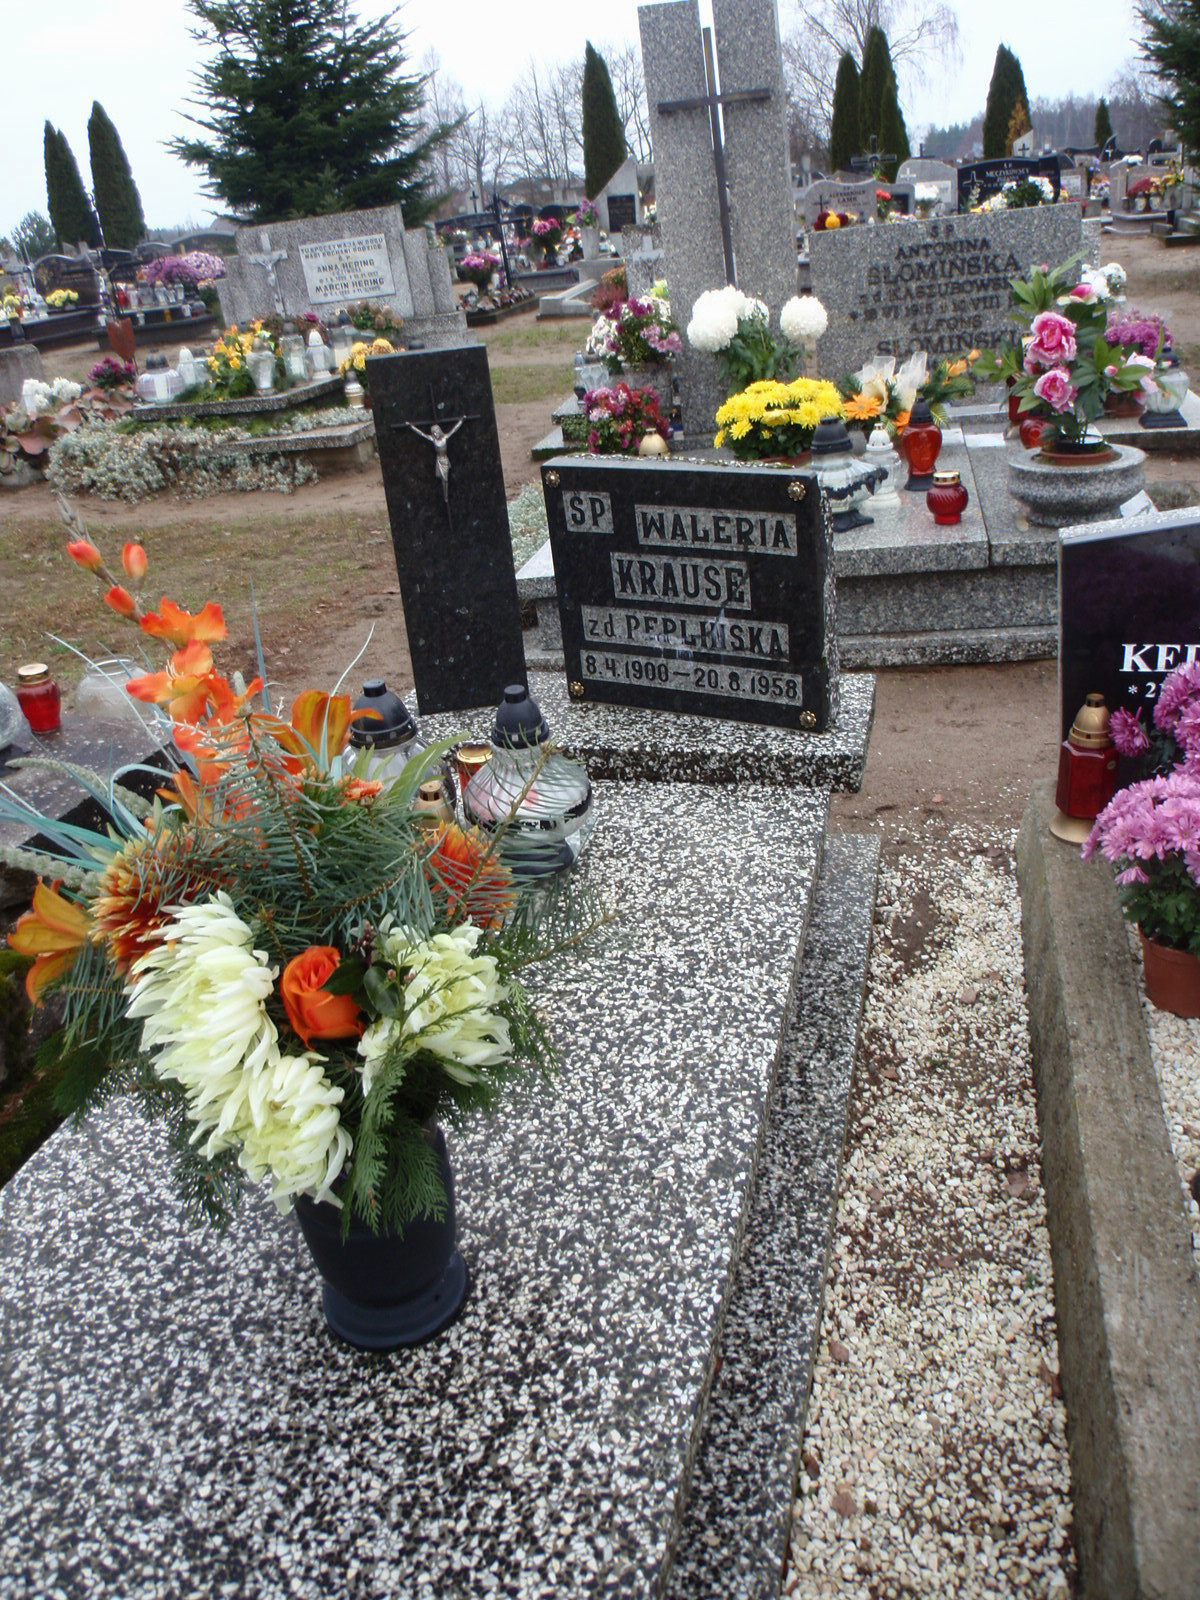 flower vases for headstones of 8 fresh flowers for headstones pictures best roses flower in fresh waleria krause peplia…ska 1900 1958 genealogy of 8 fresh flowers for headstones pictures